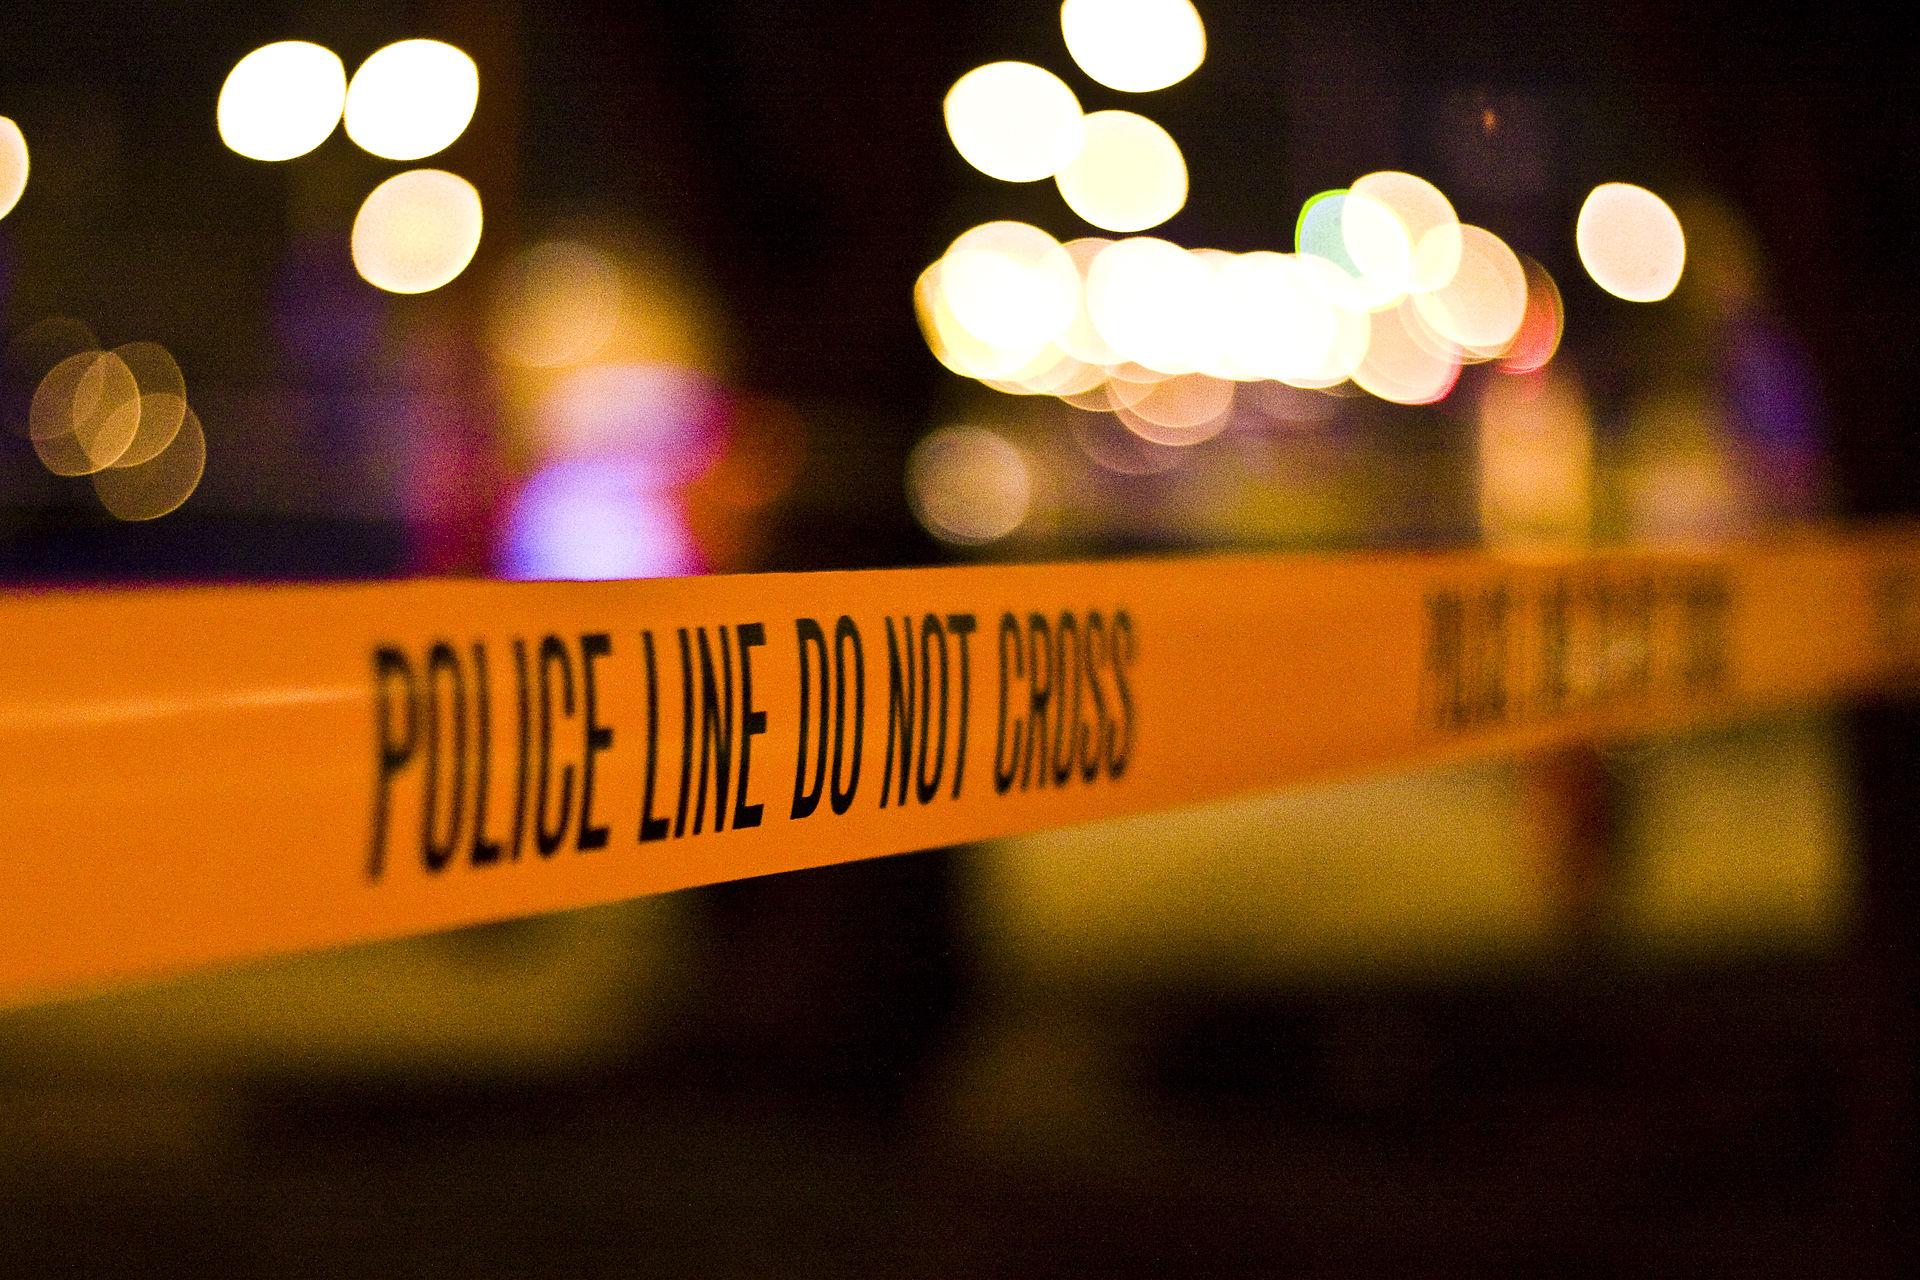 Hit and Run in South Sacramento Pedestrian Death